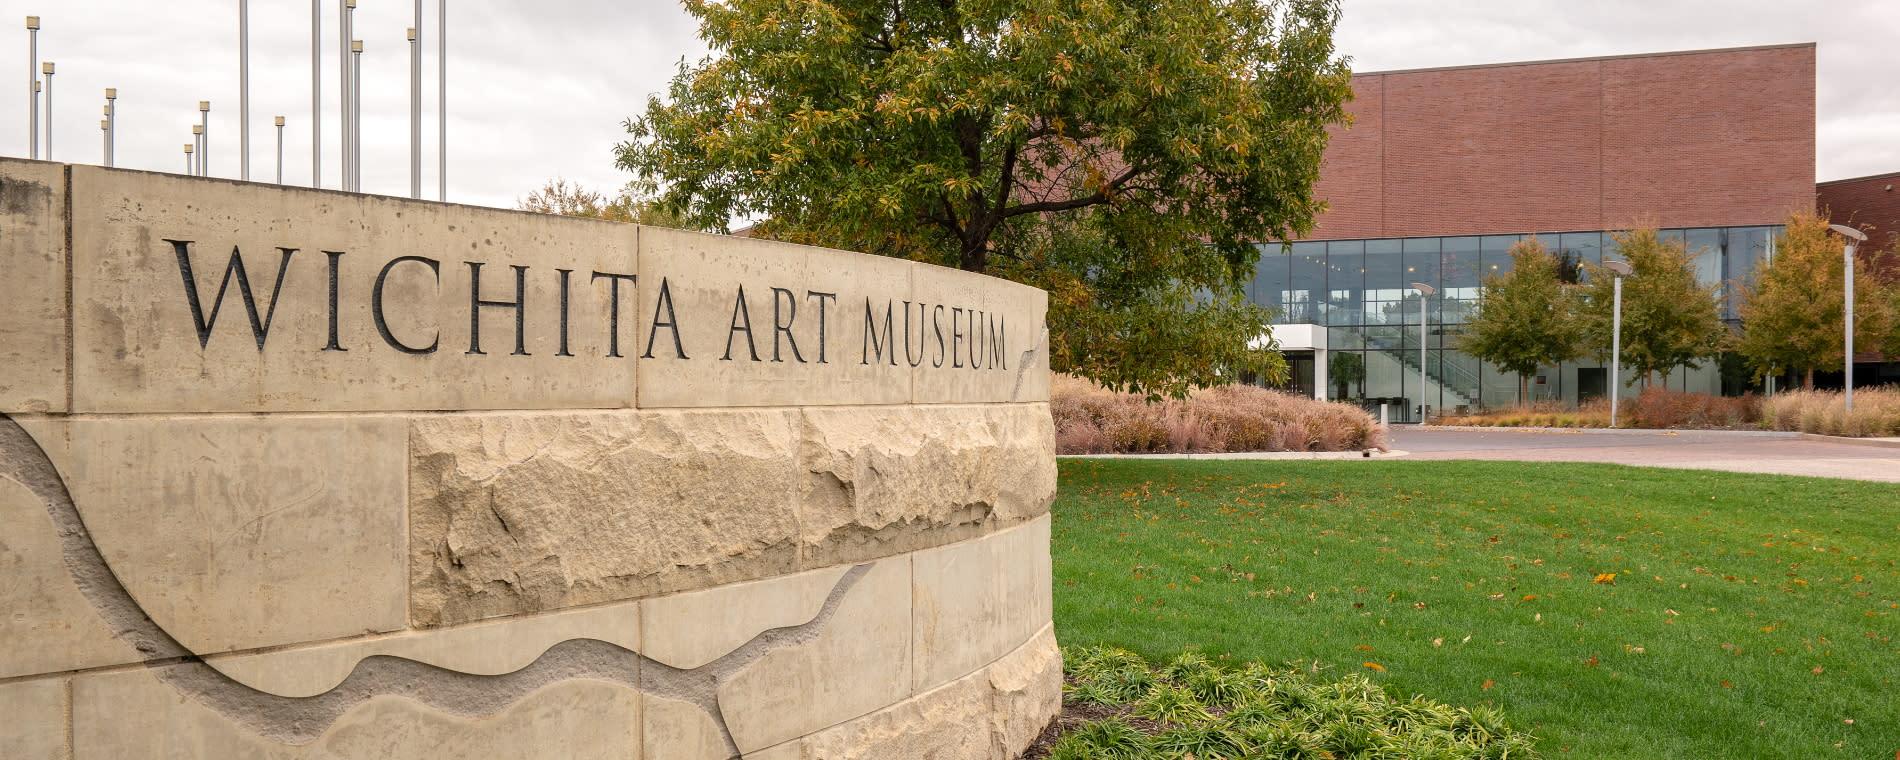 Wichita Art Museum Entrance